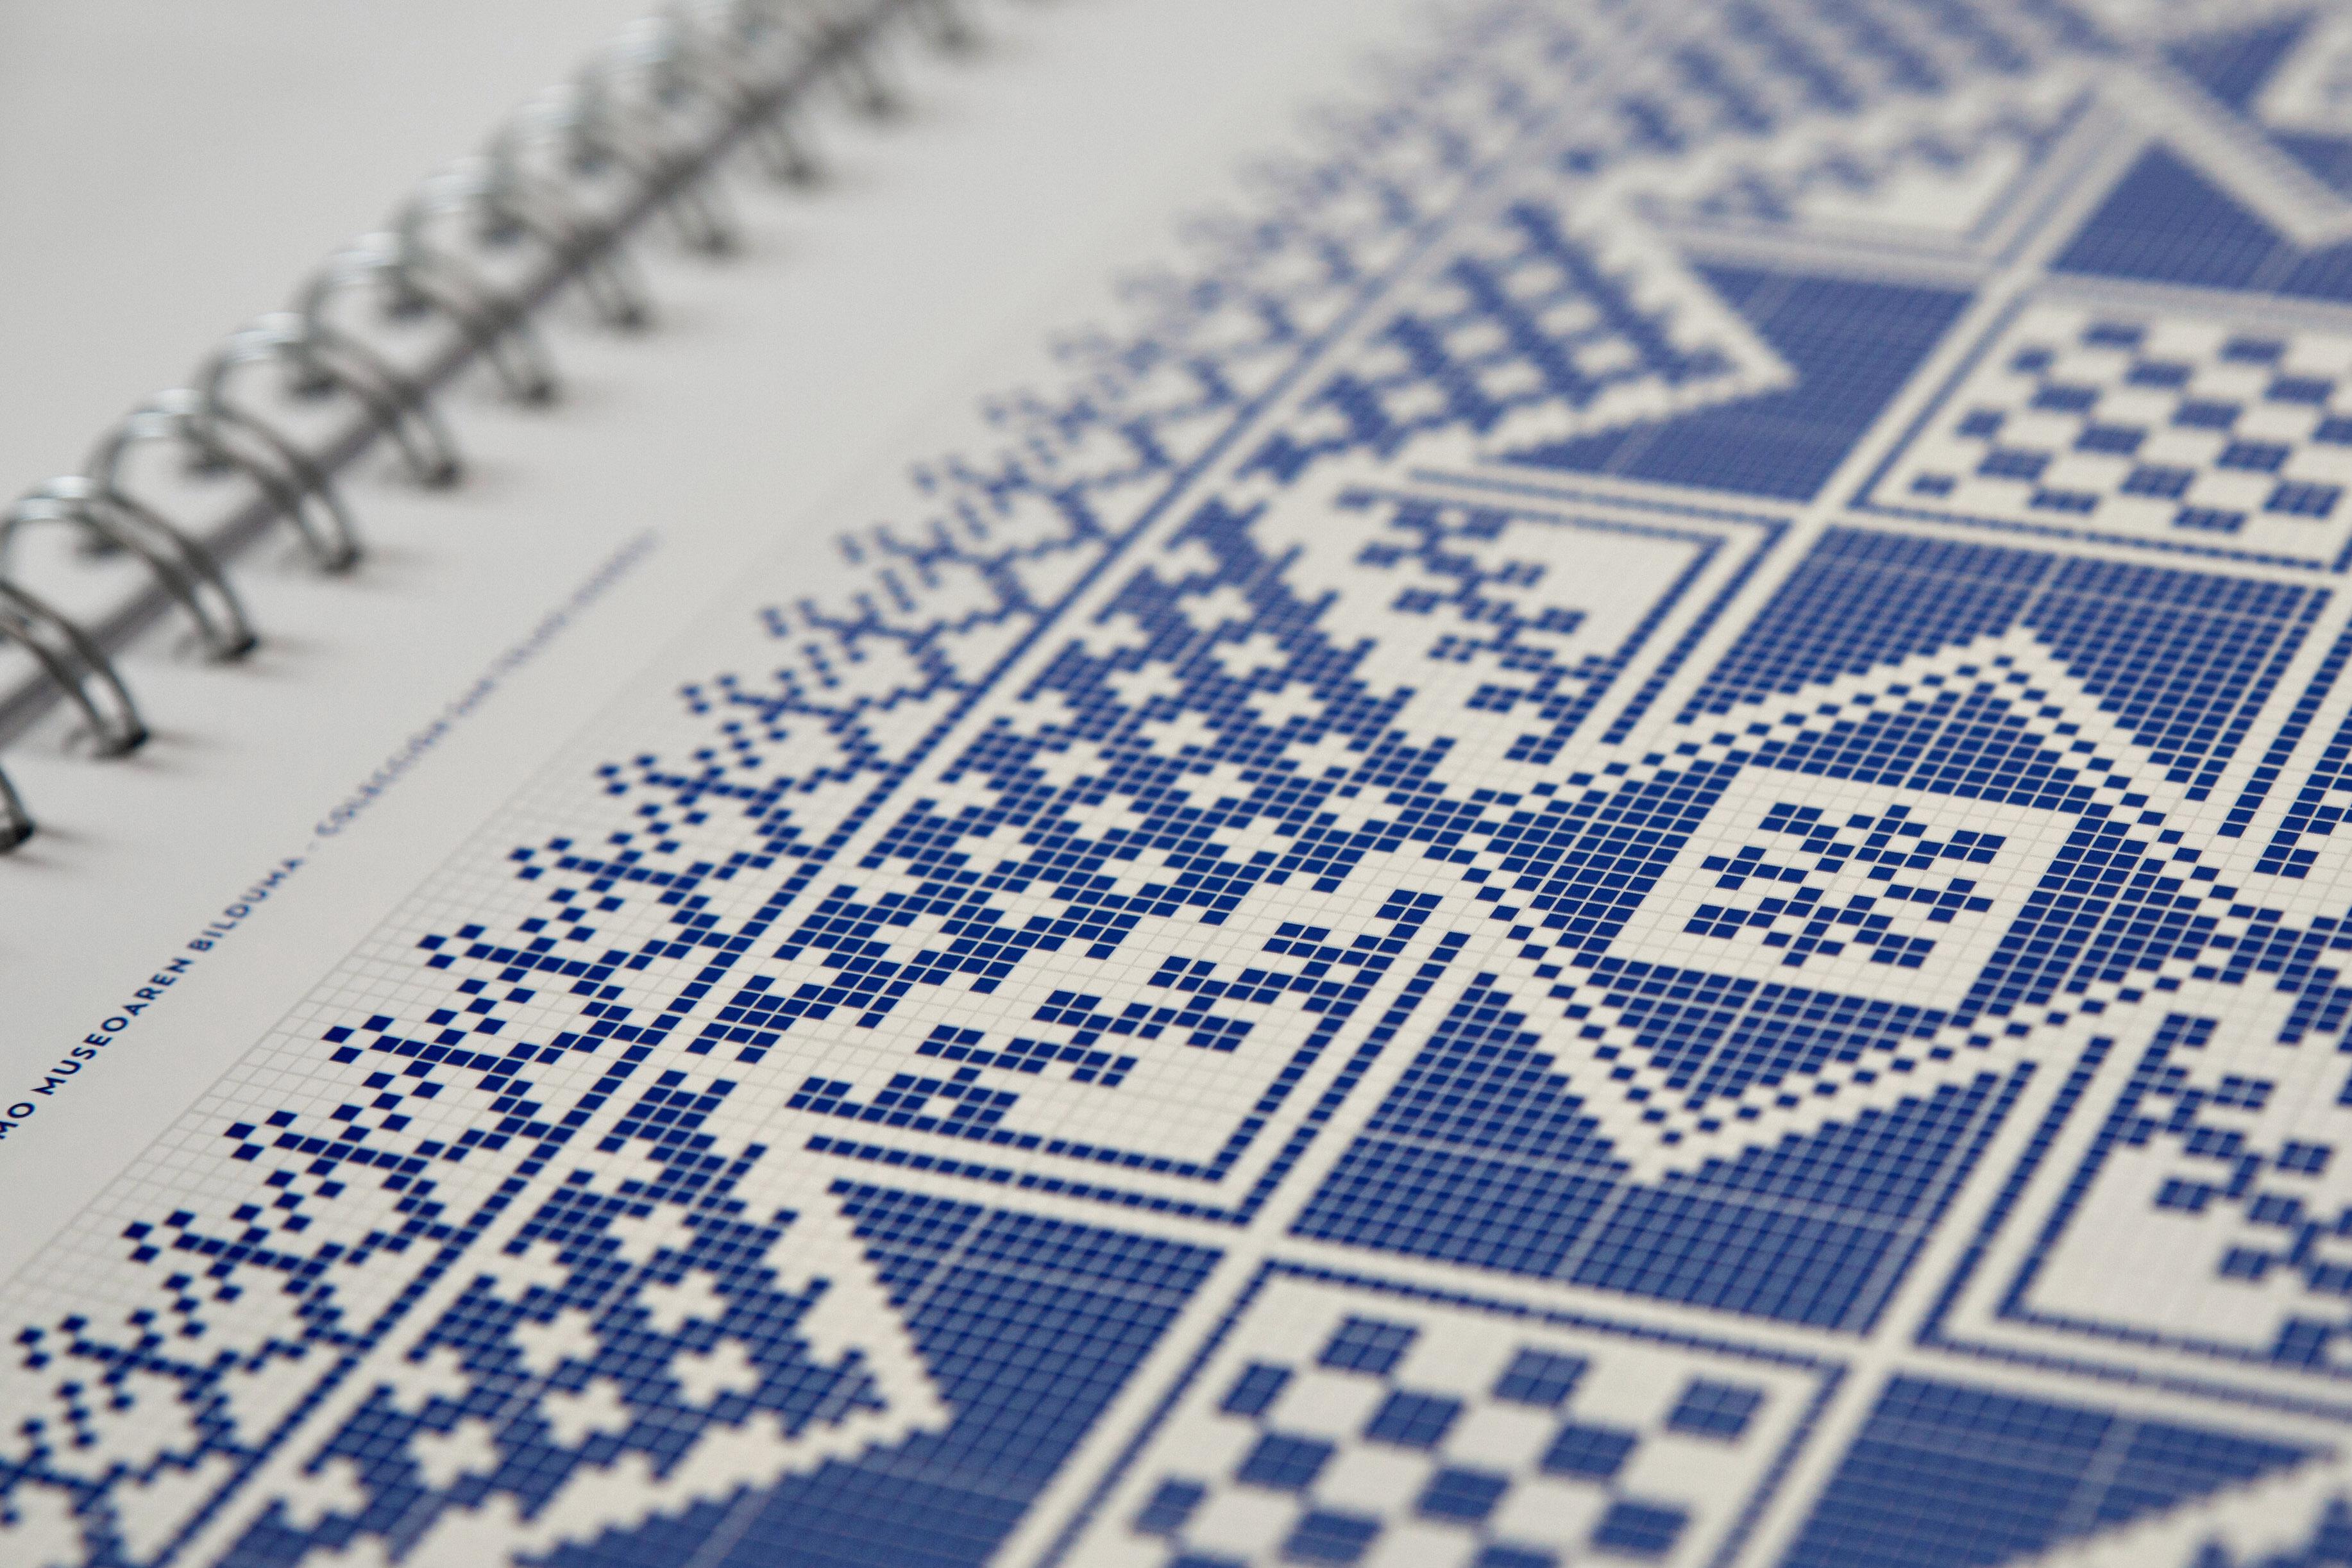 Bordados - Diseño editorial para STM by Strogoff Komunikazioa - Creative Work - $i